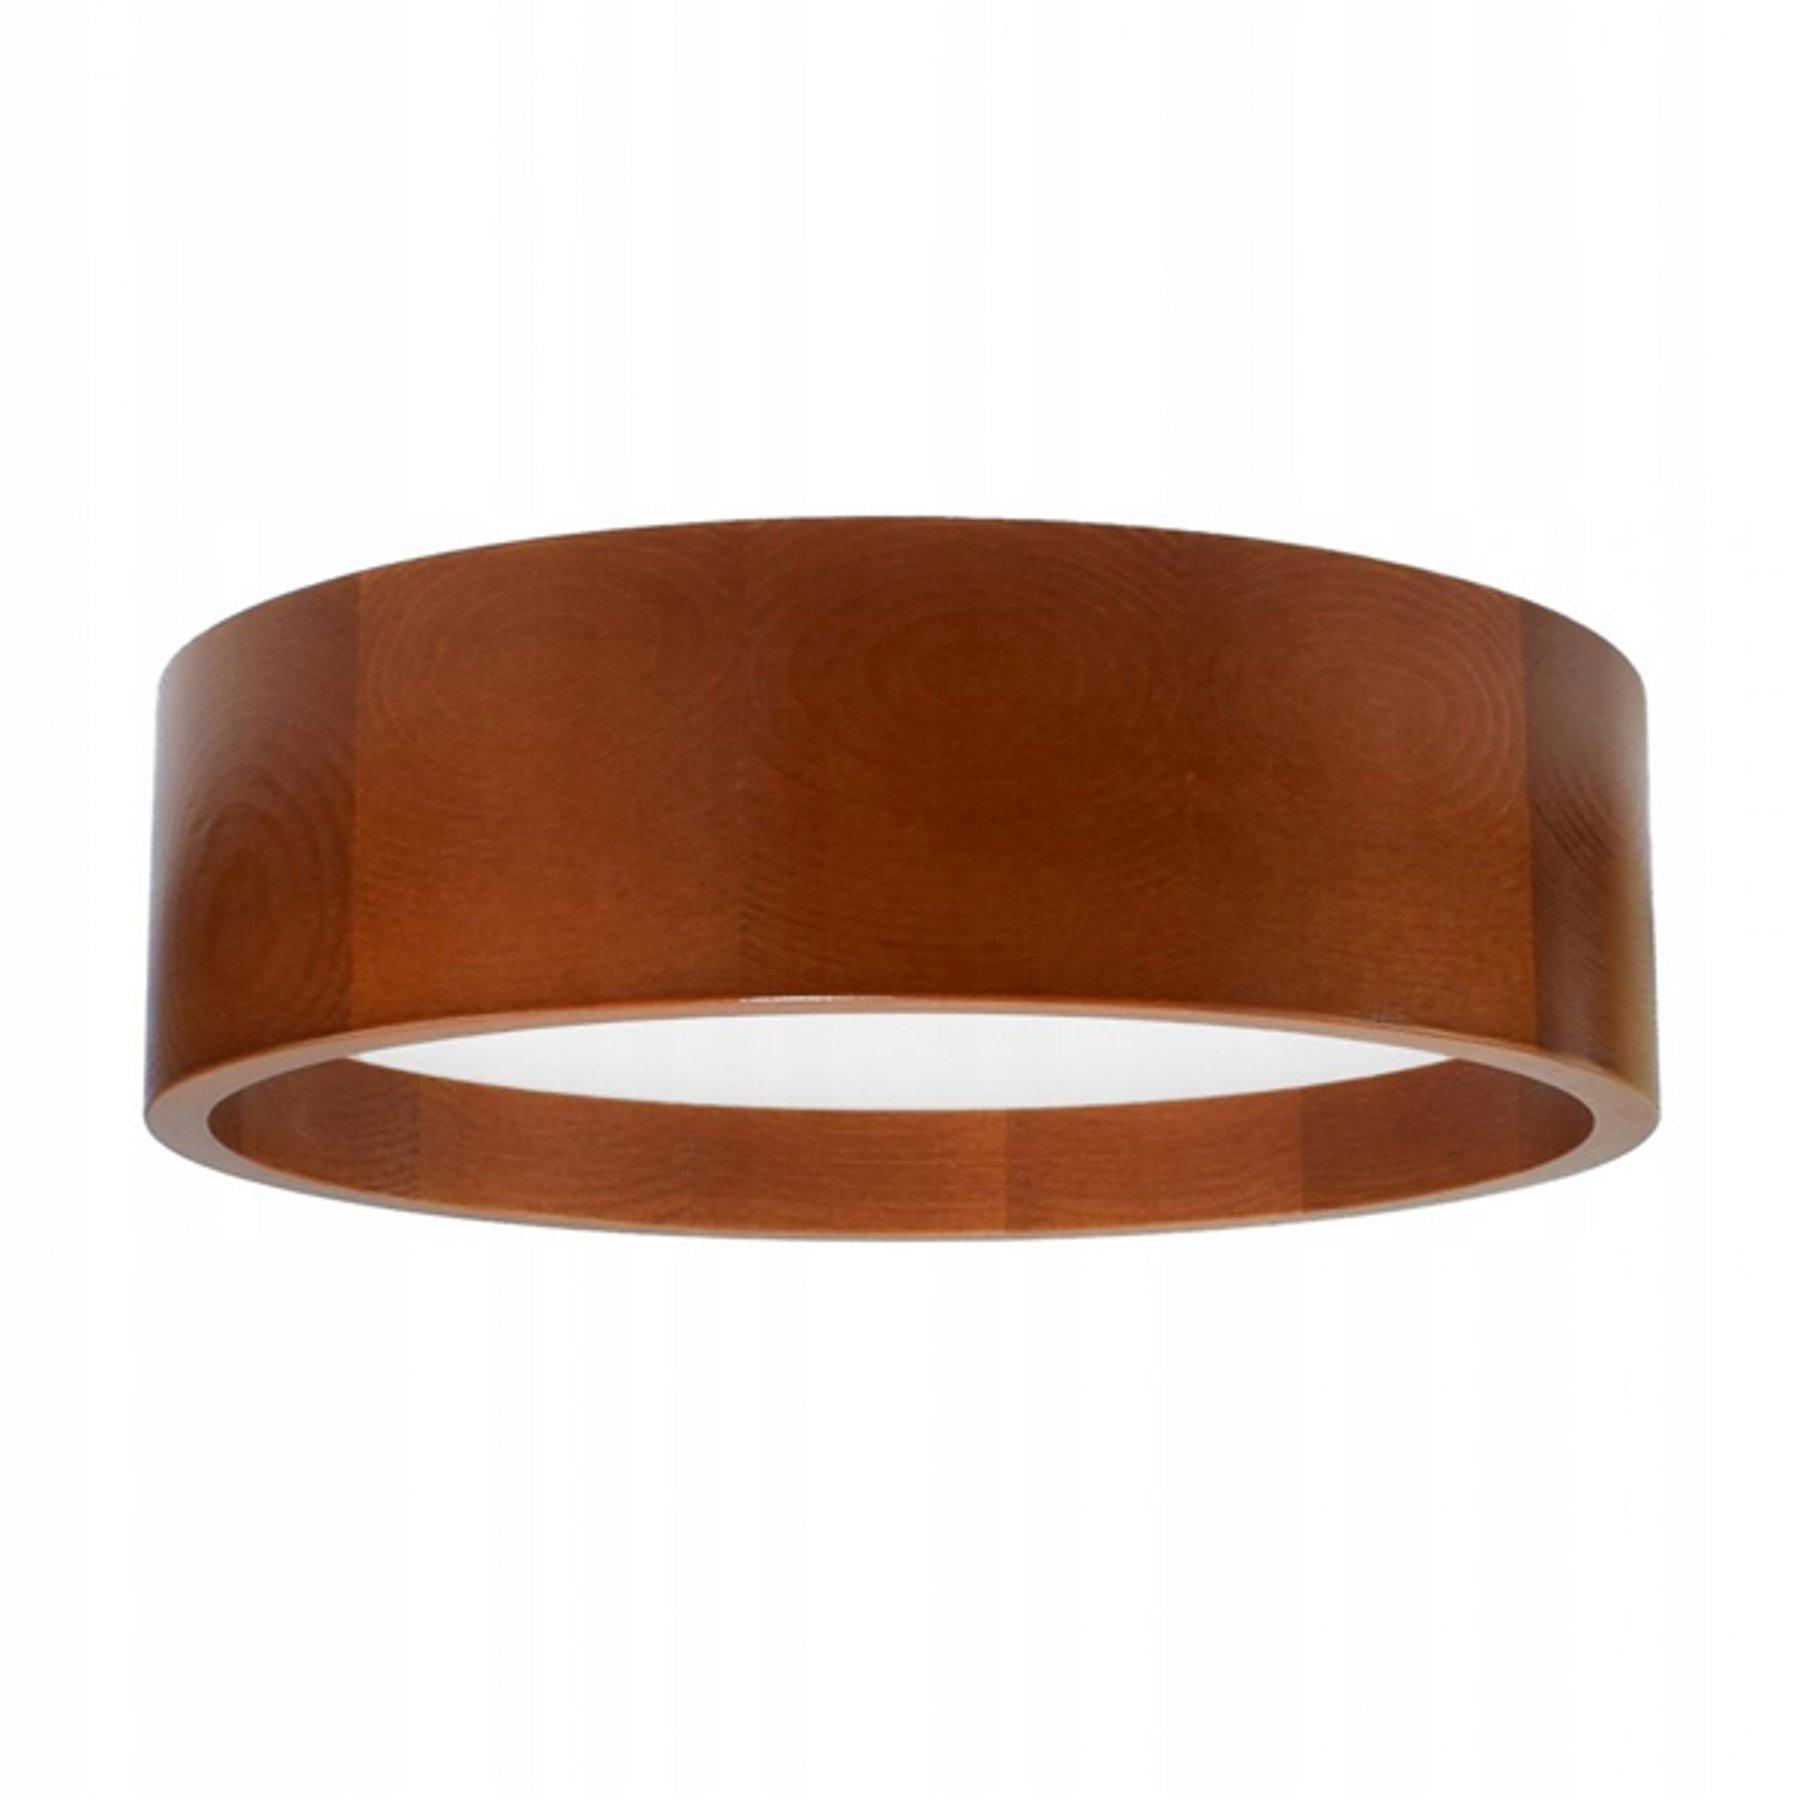 LED-taklampe Deep, Ø 38 cm, brun